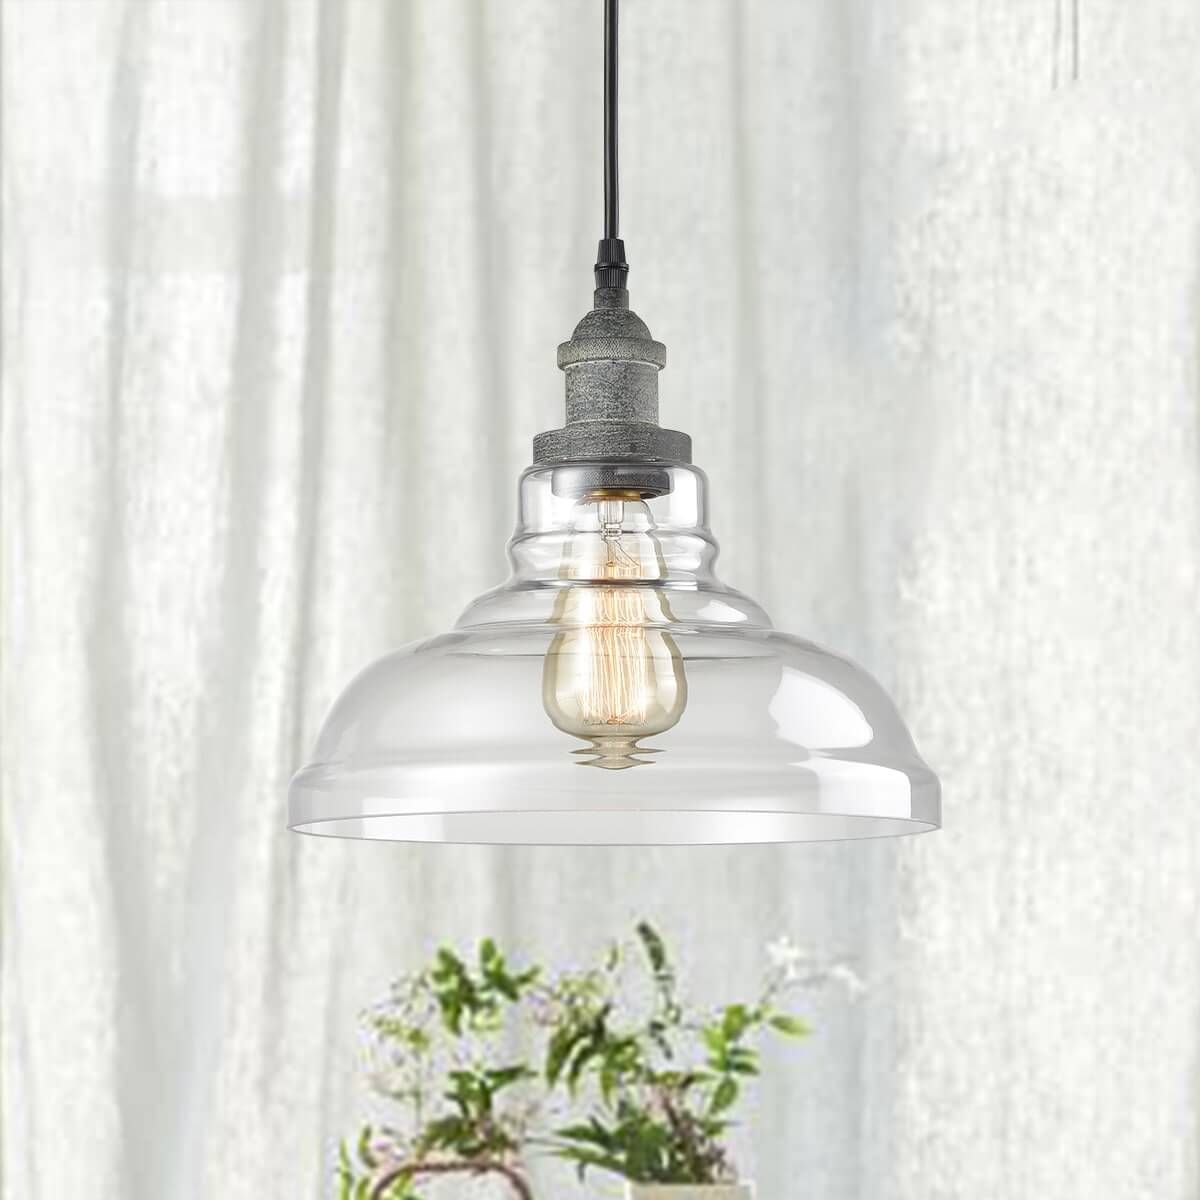 Glass Rustic Mycete kitchen island pendant lighting